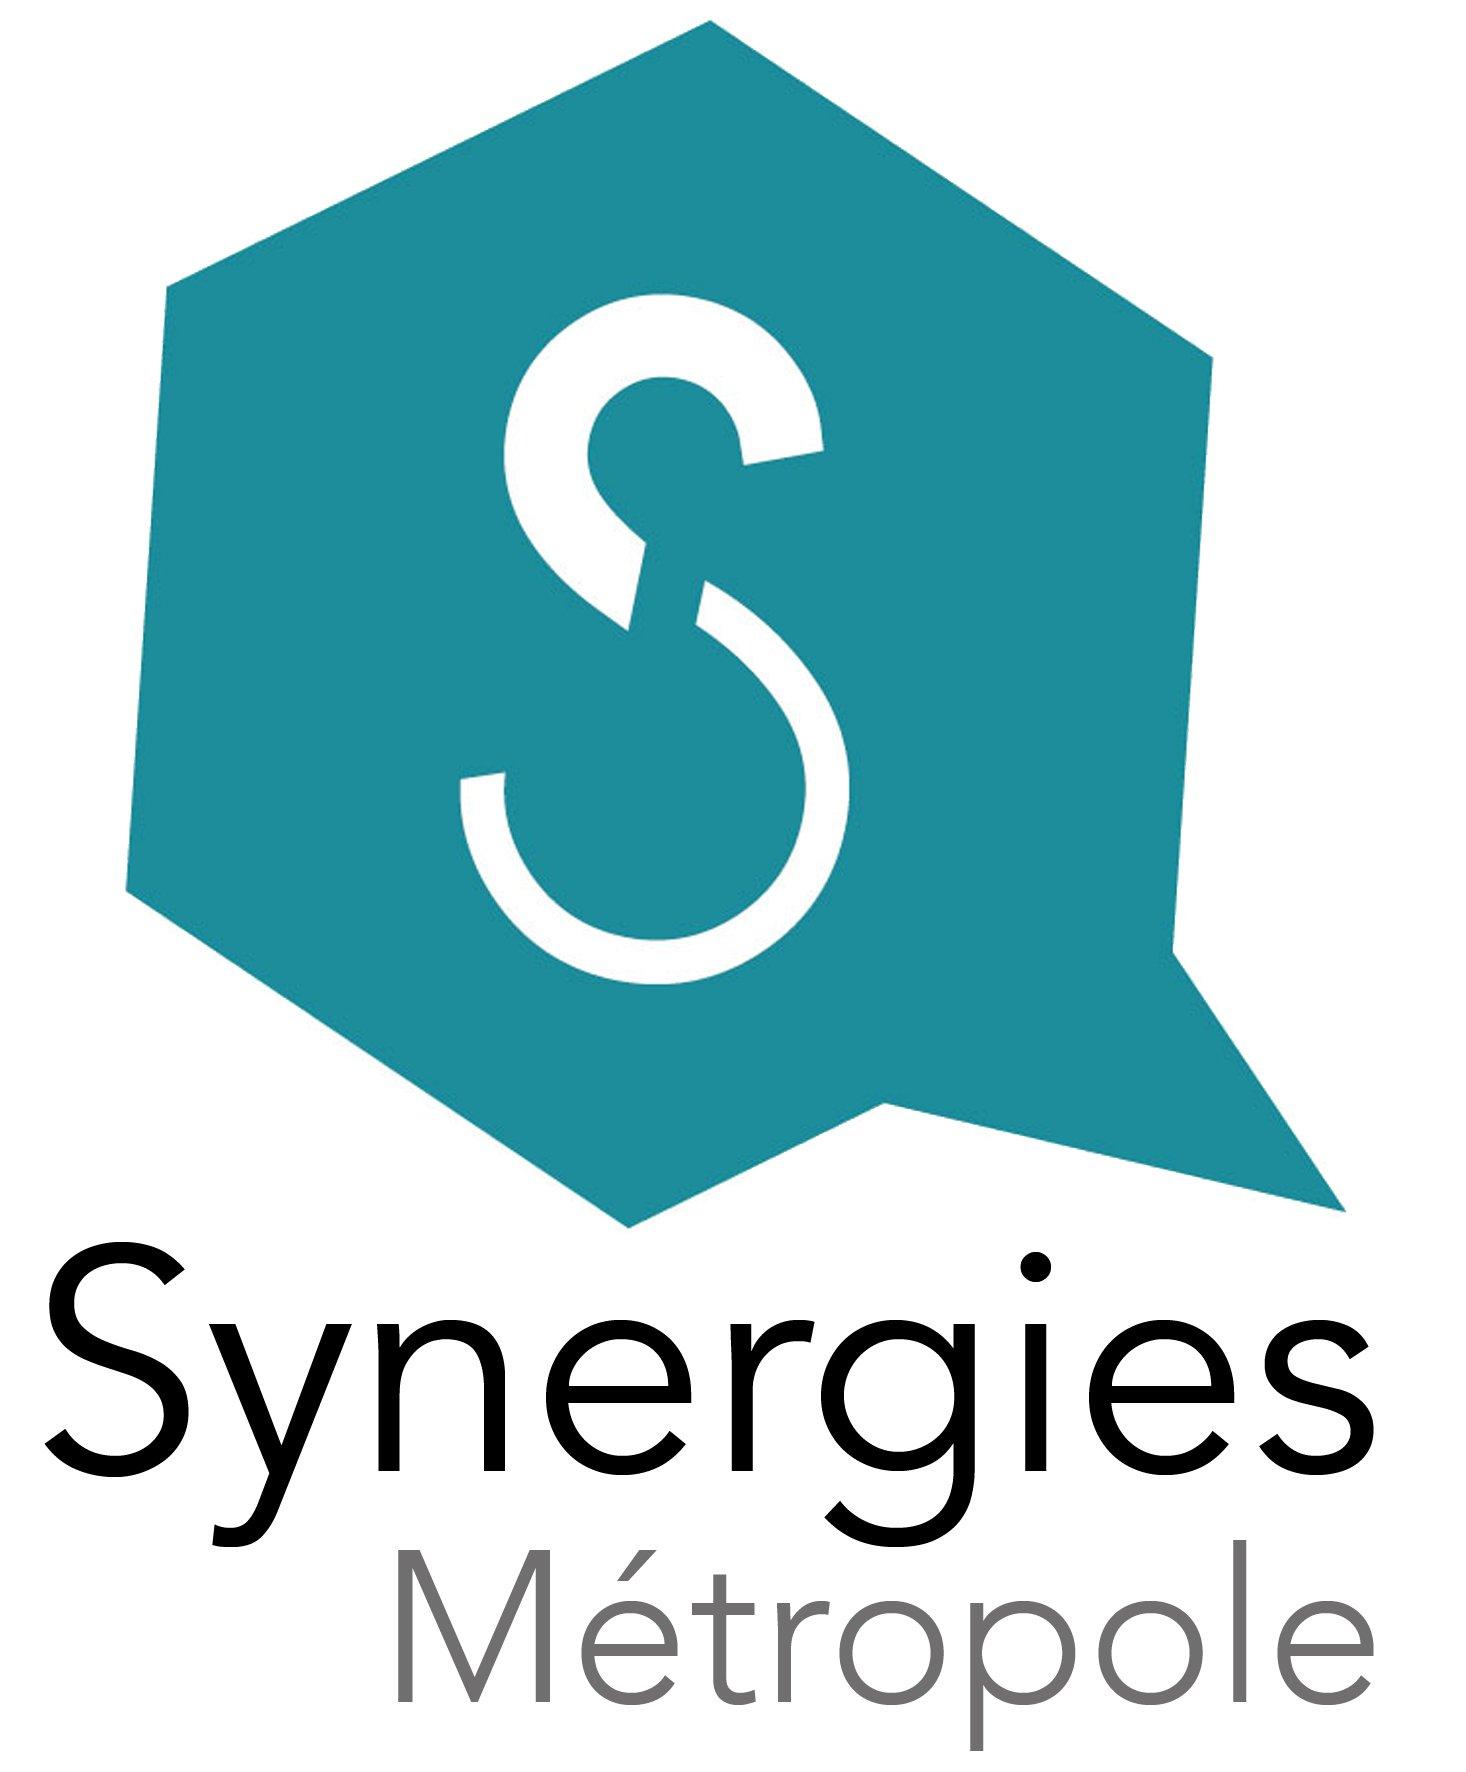 Synergies Métropole